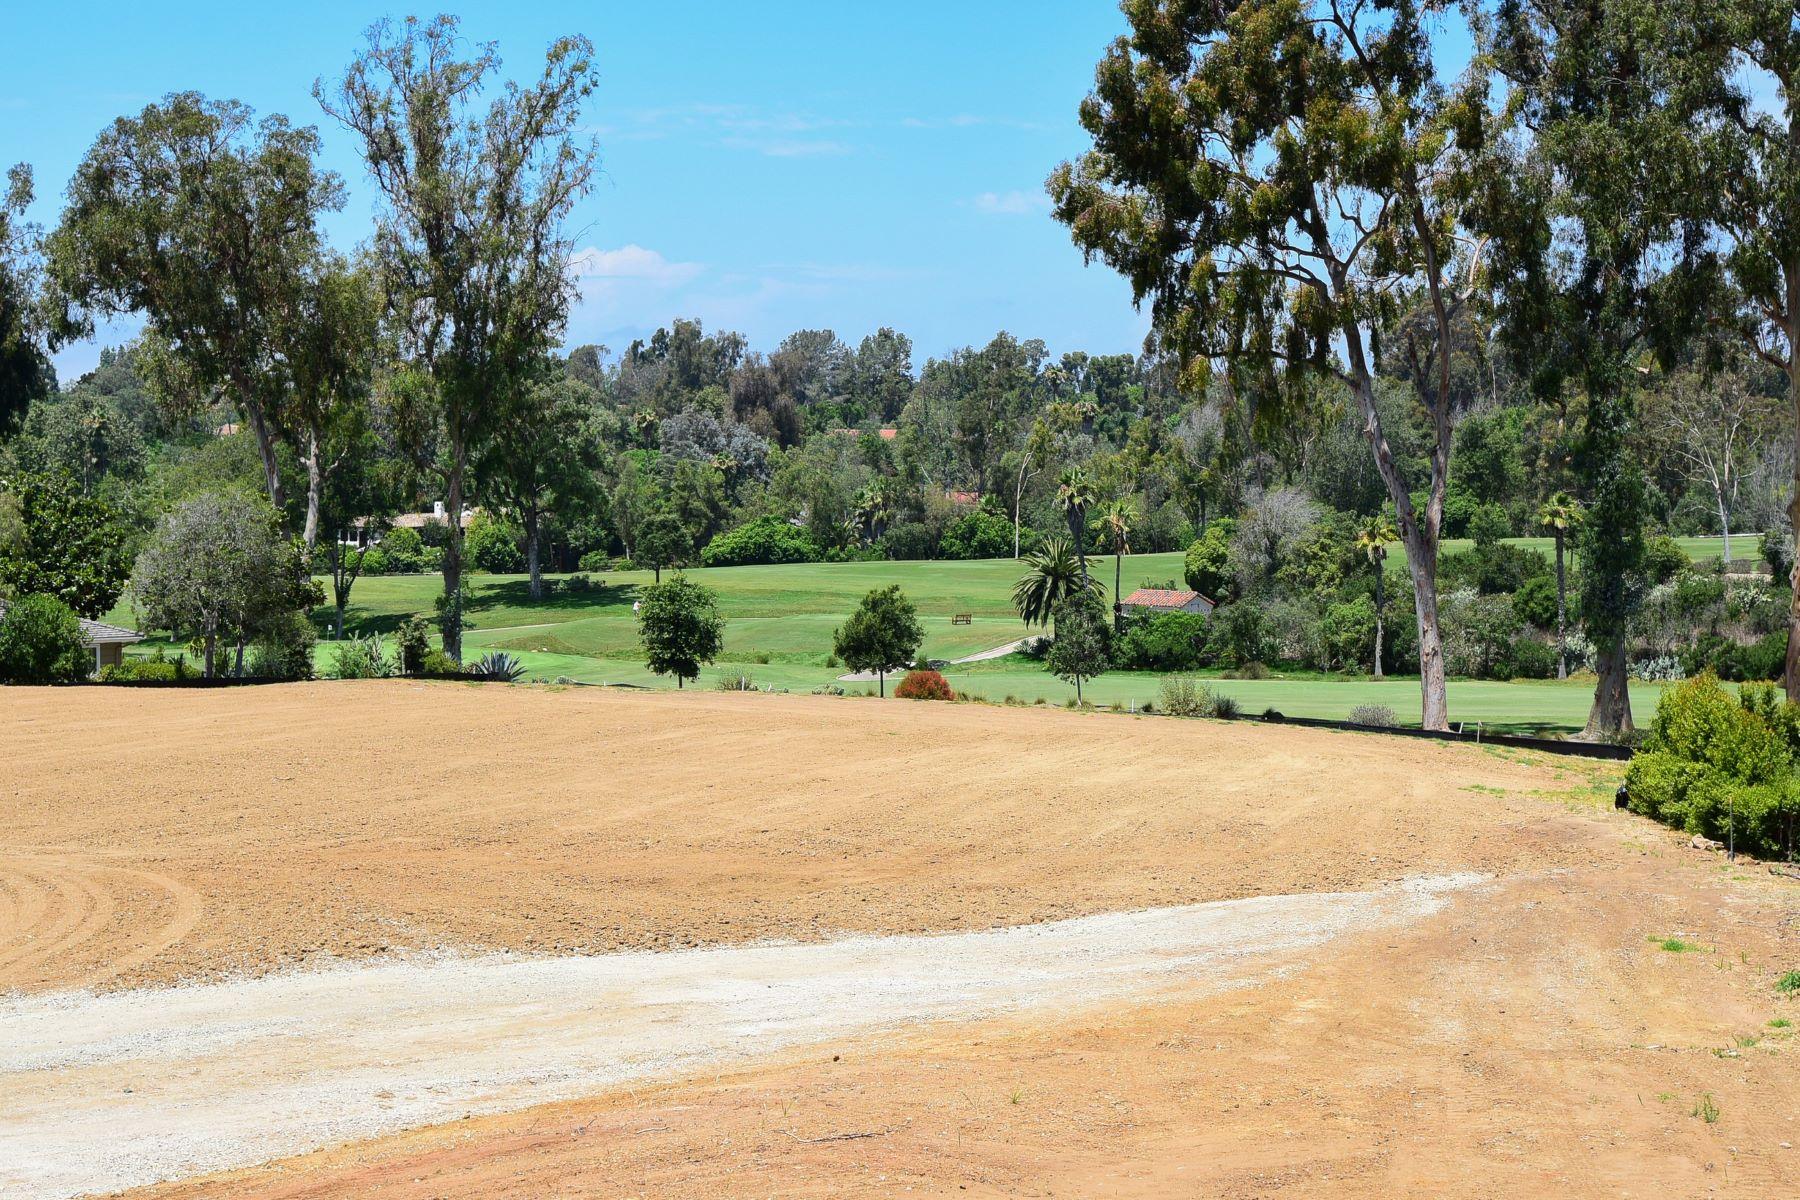 Property for Sale at 6380 Paseo Delicias Rancho Santa Fe, California 92067 United States